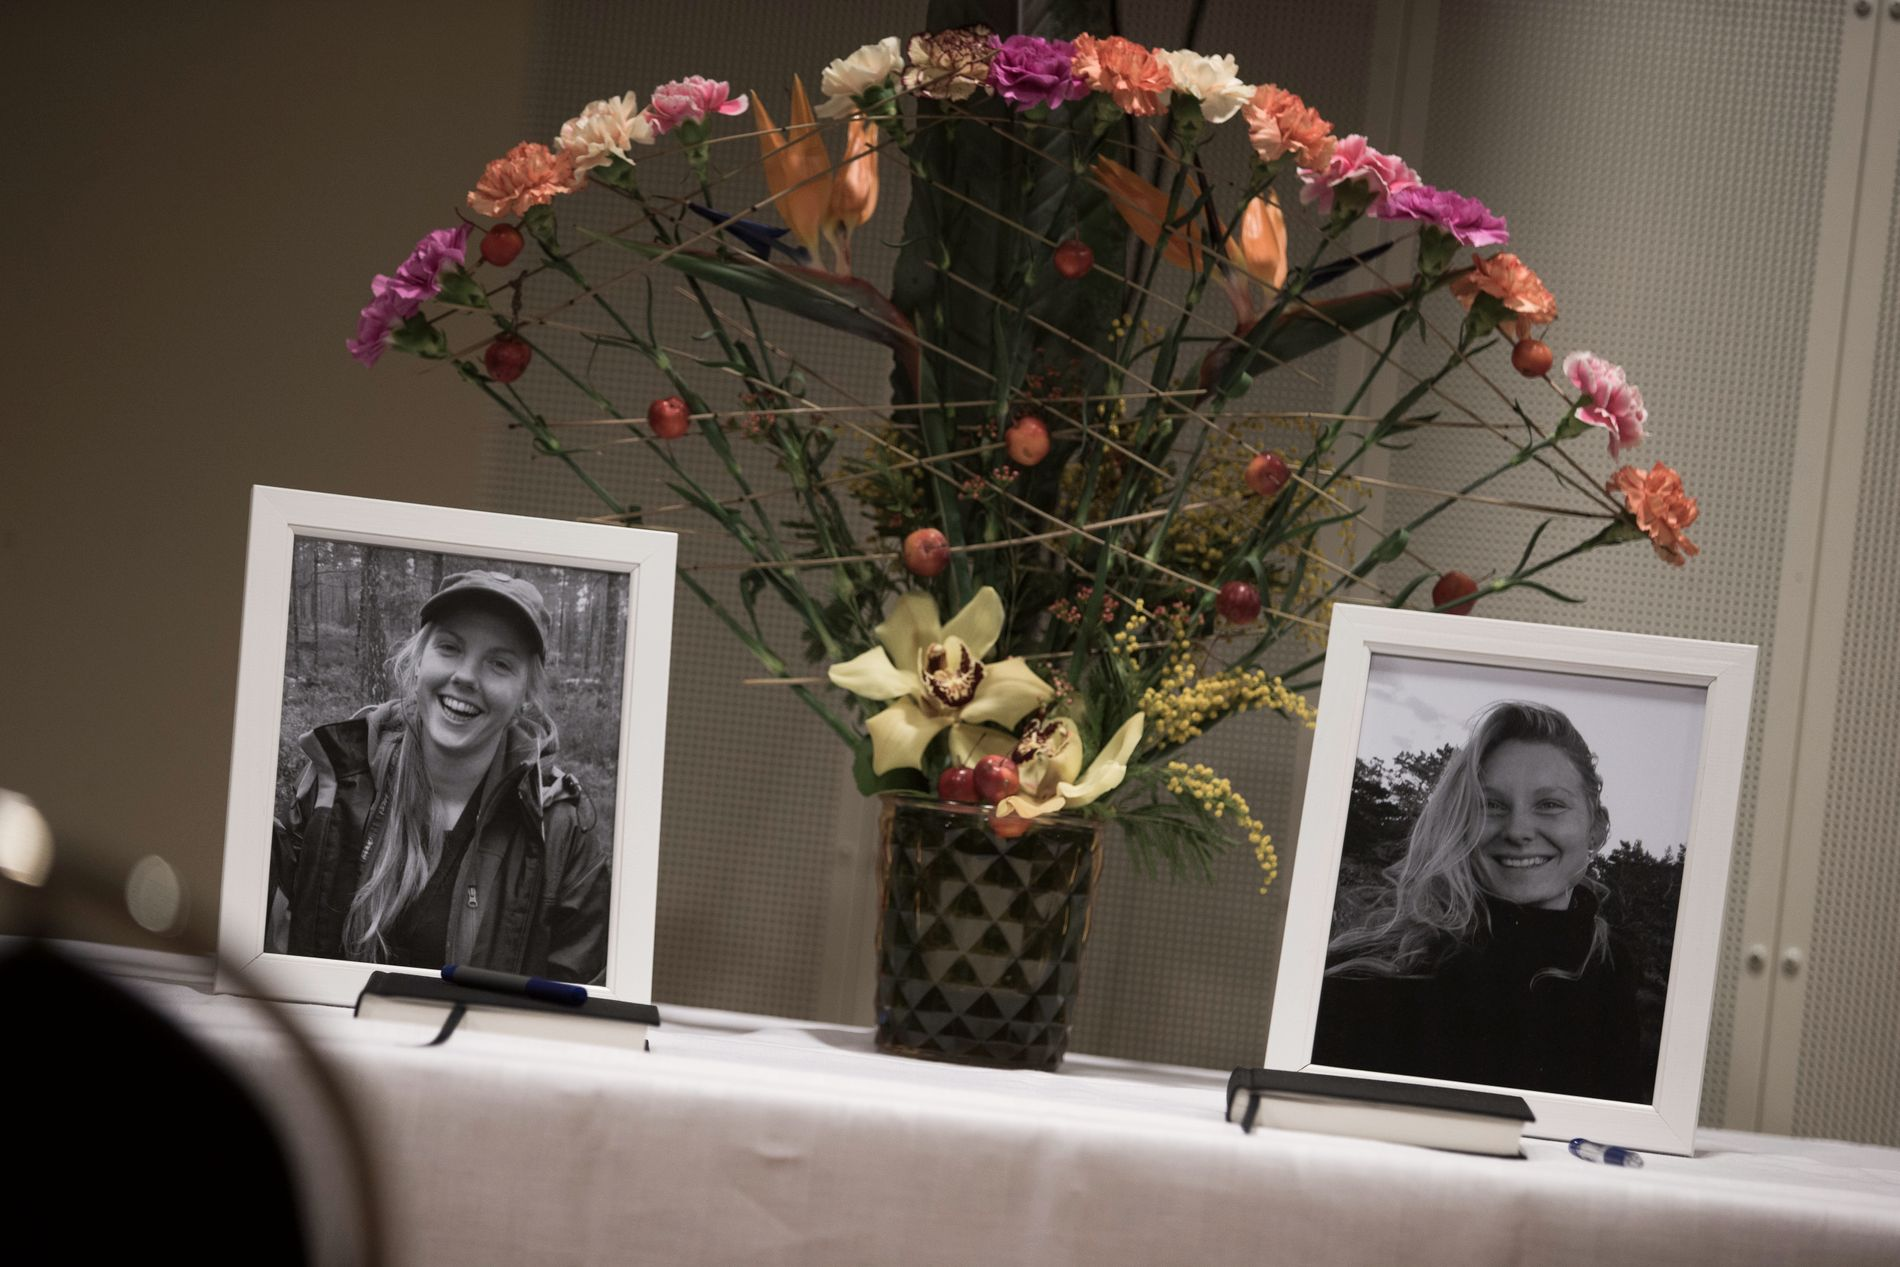 Maren Ueland og Louisa Vesterager Jespersen ble drept i Marokko i desember i fjor. Foto: Trond Reidar Teigen / NTB scanpix